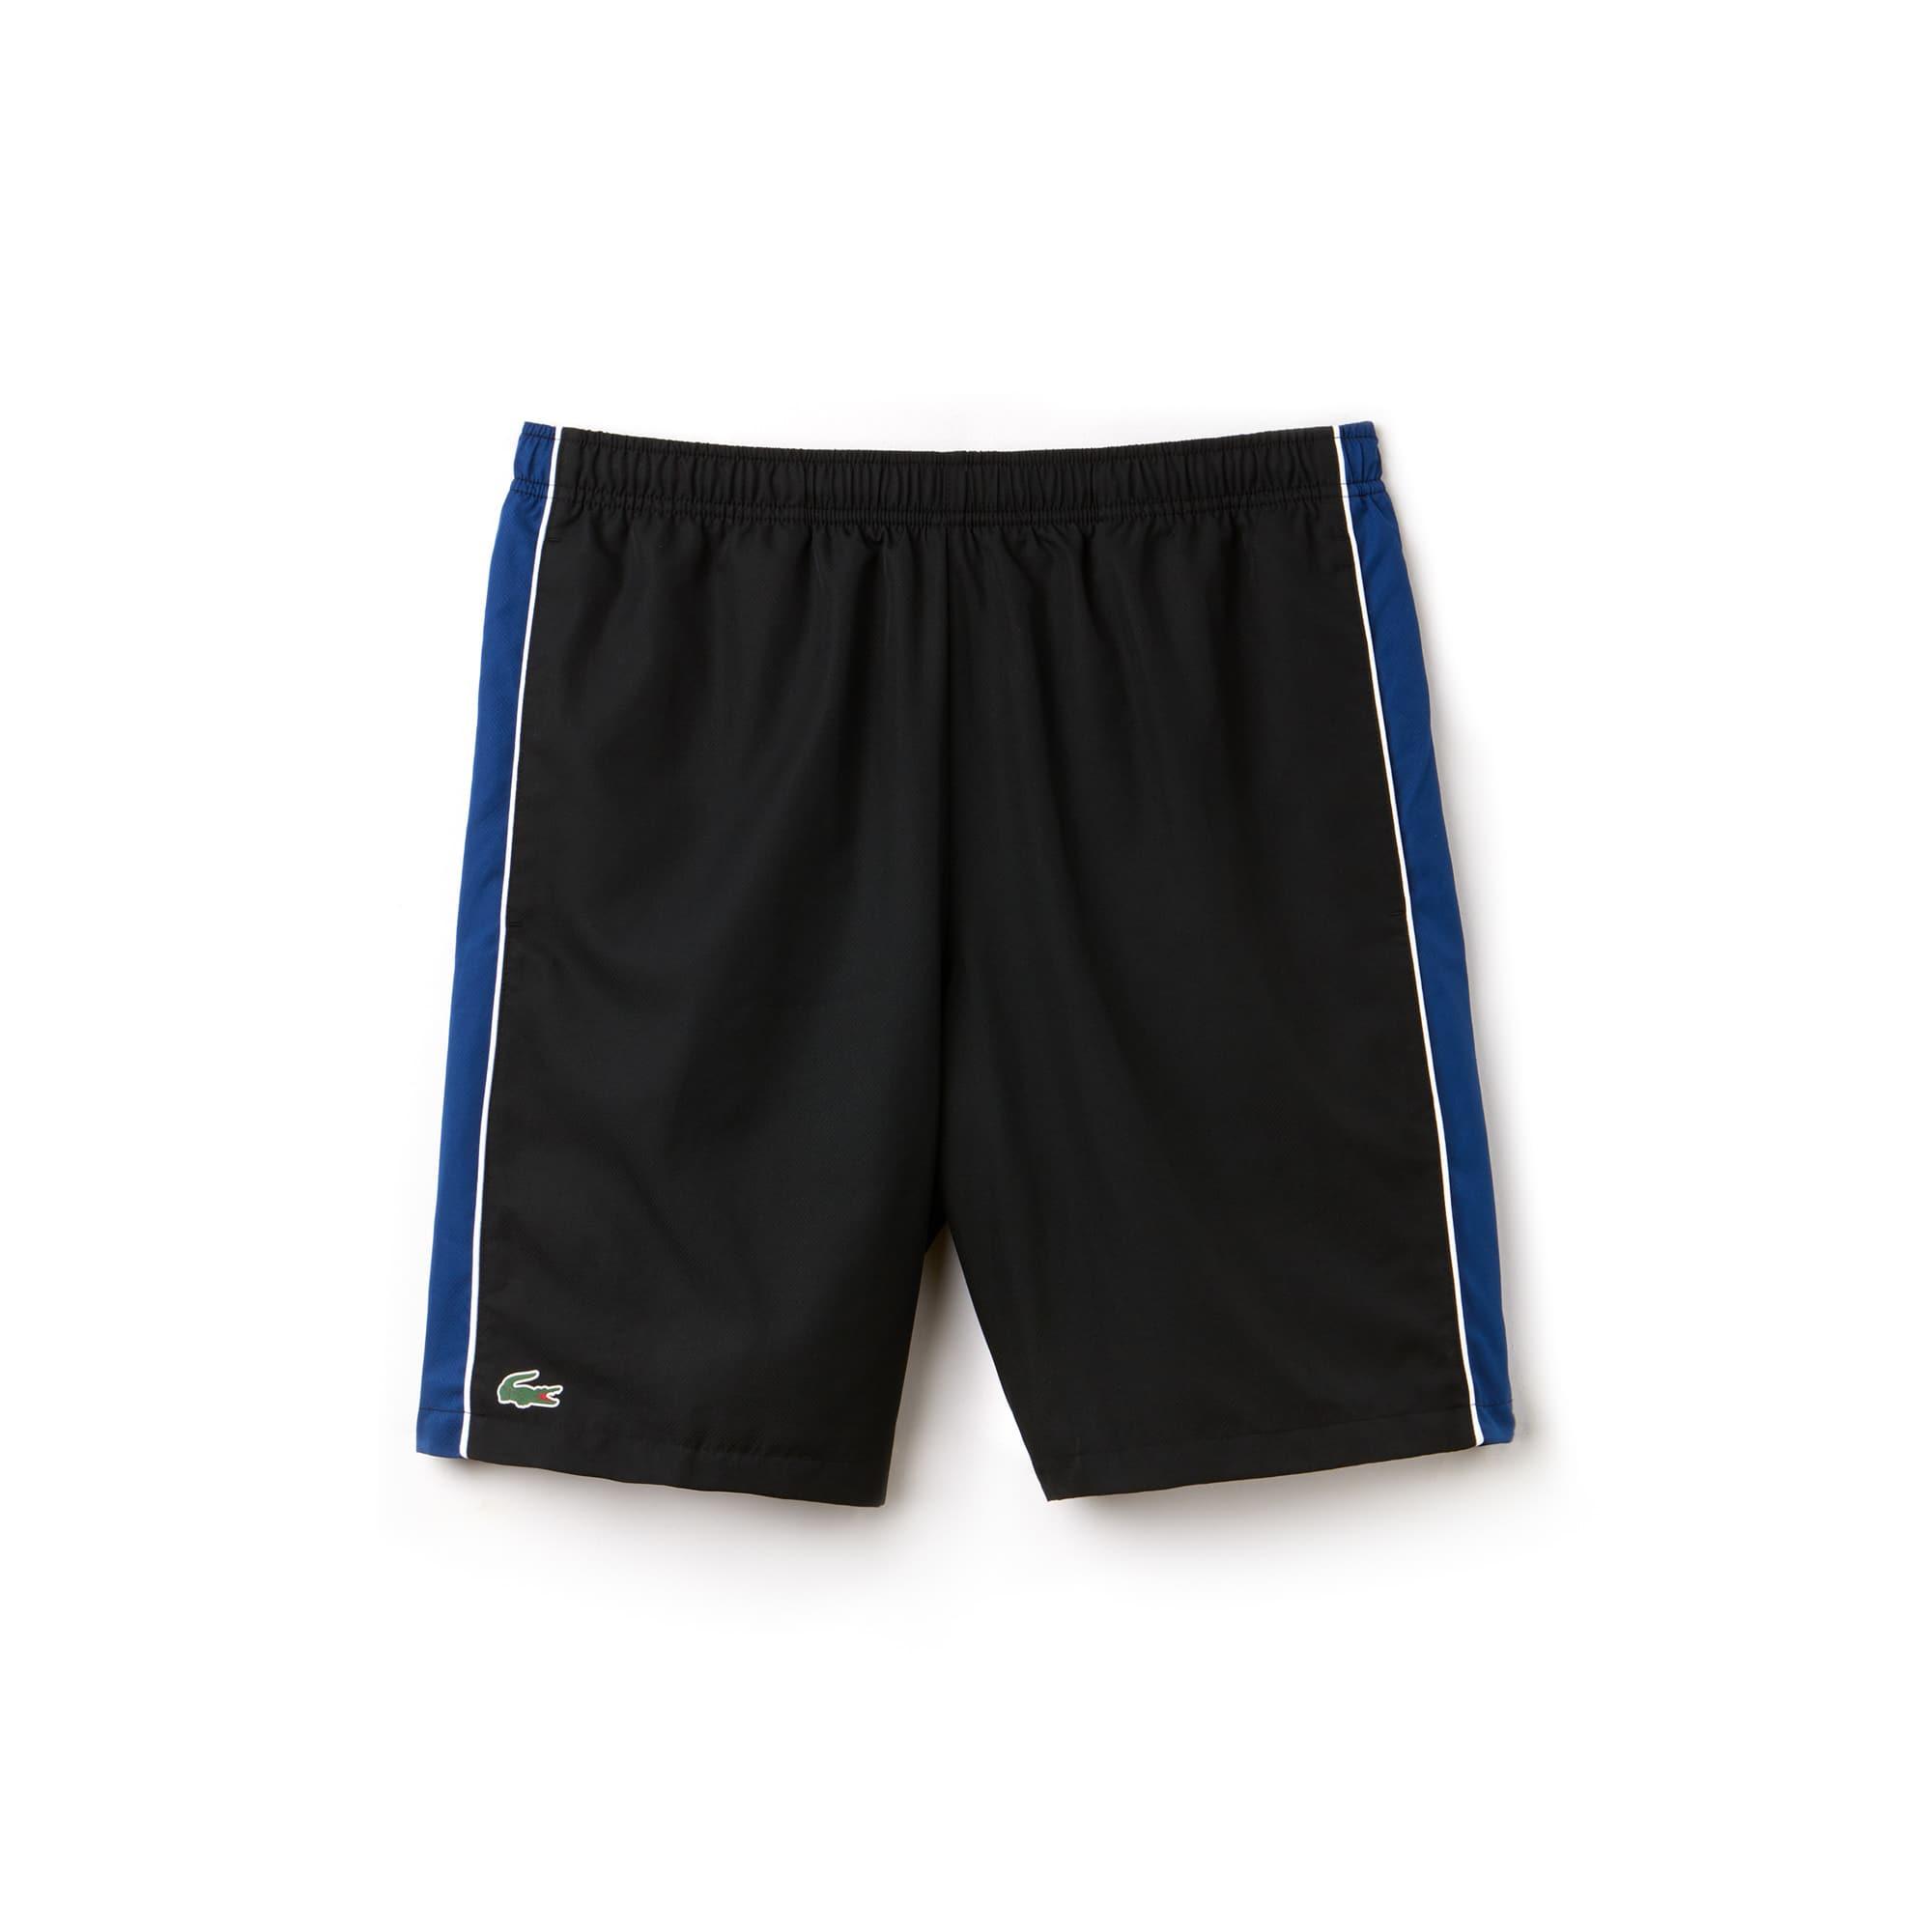 Men's SPORT Colorblock Shorts - x Novak Djokovic